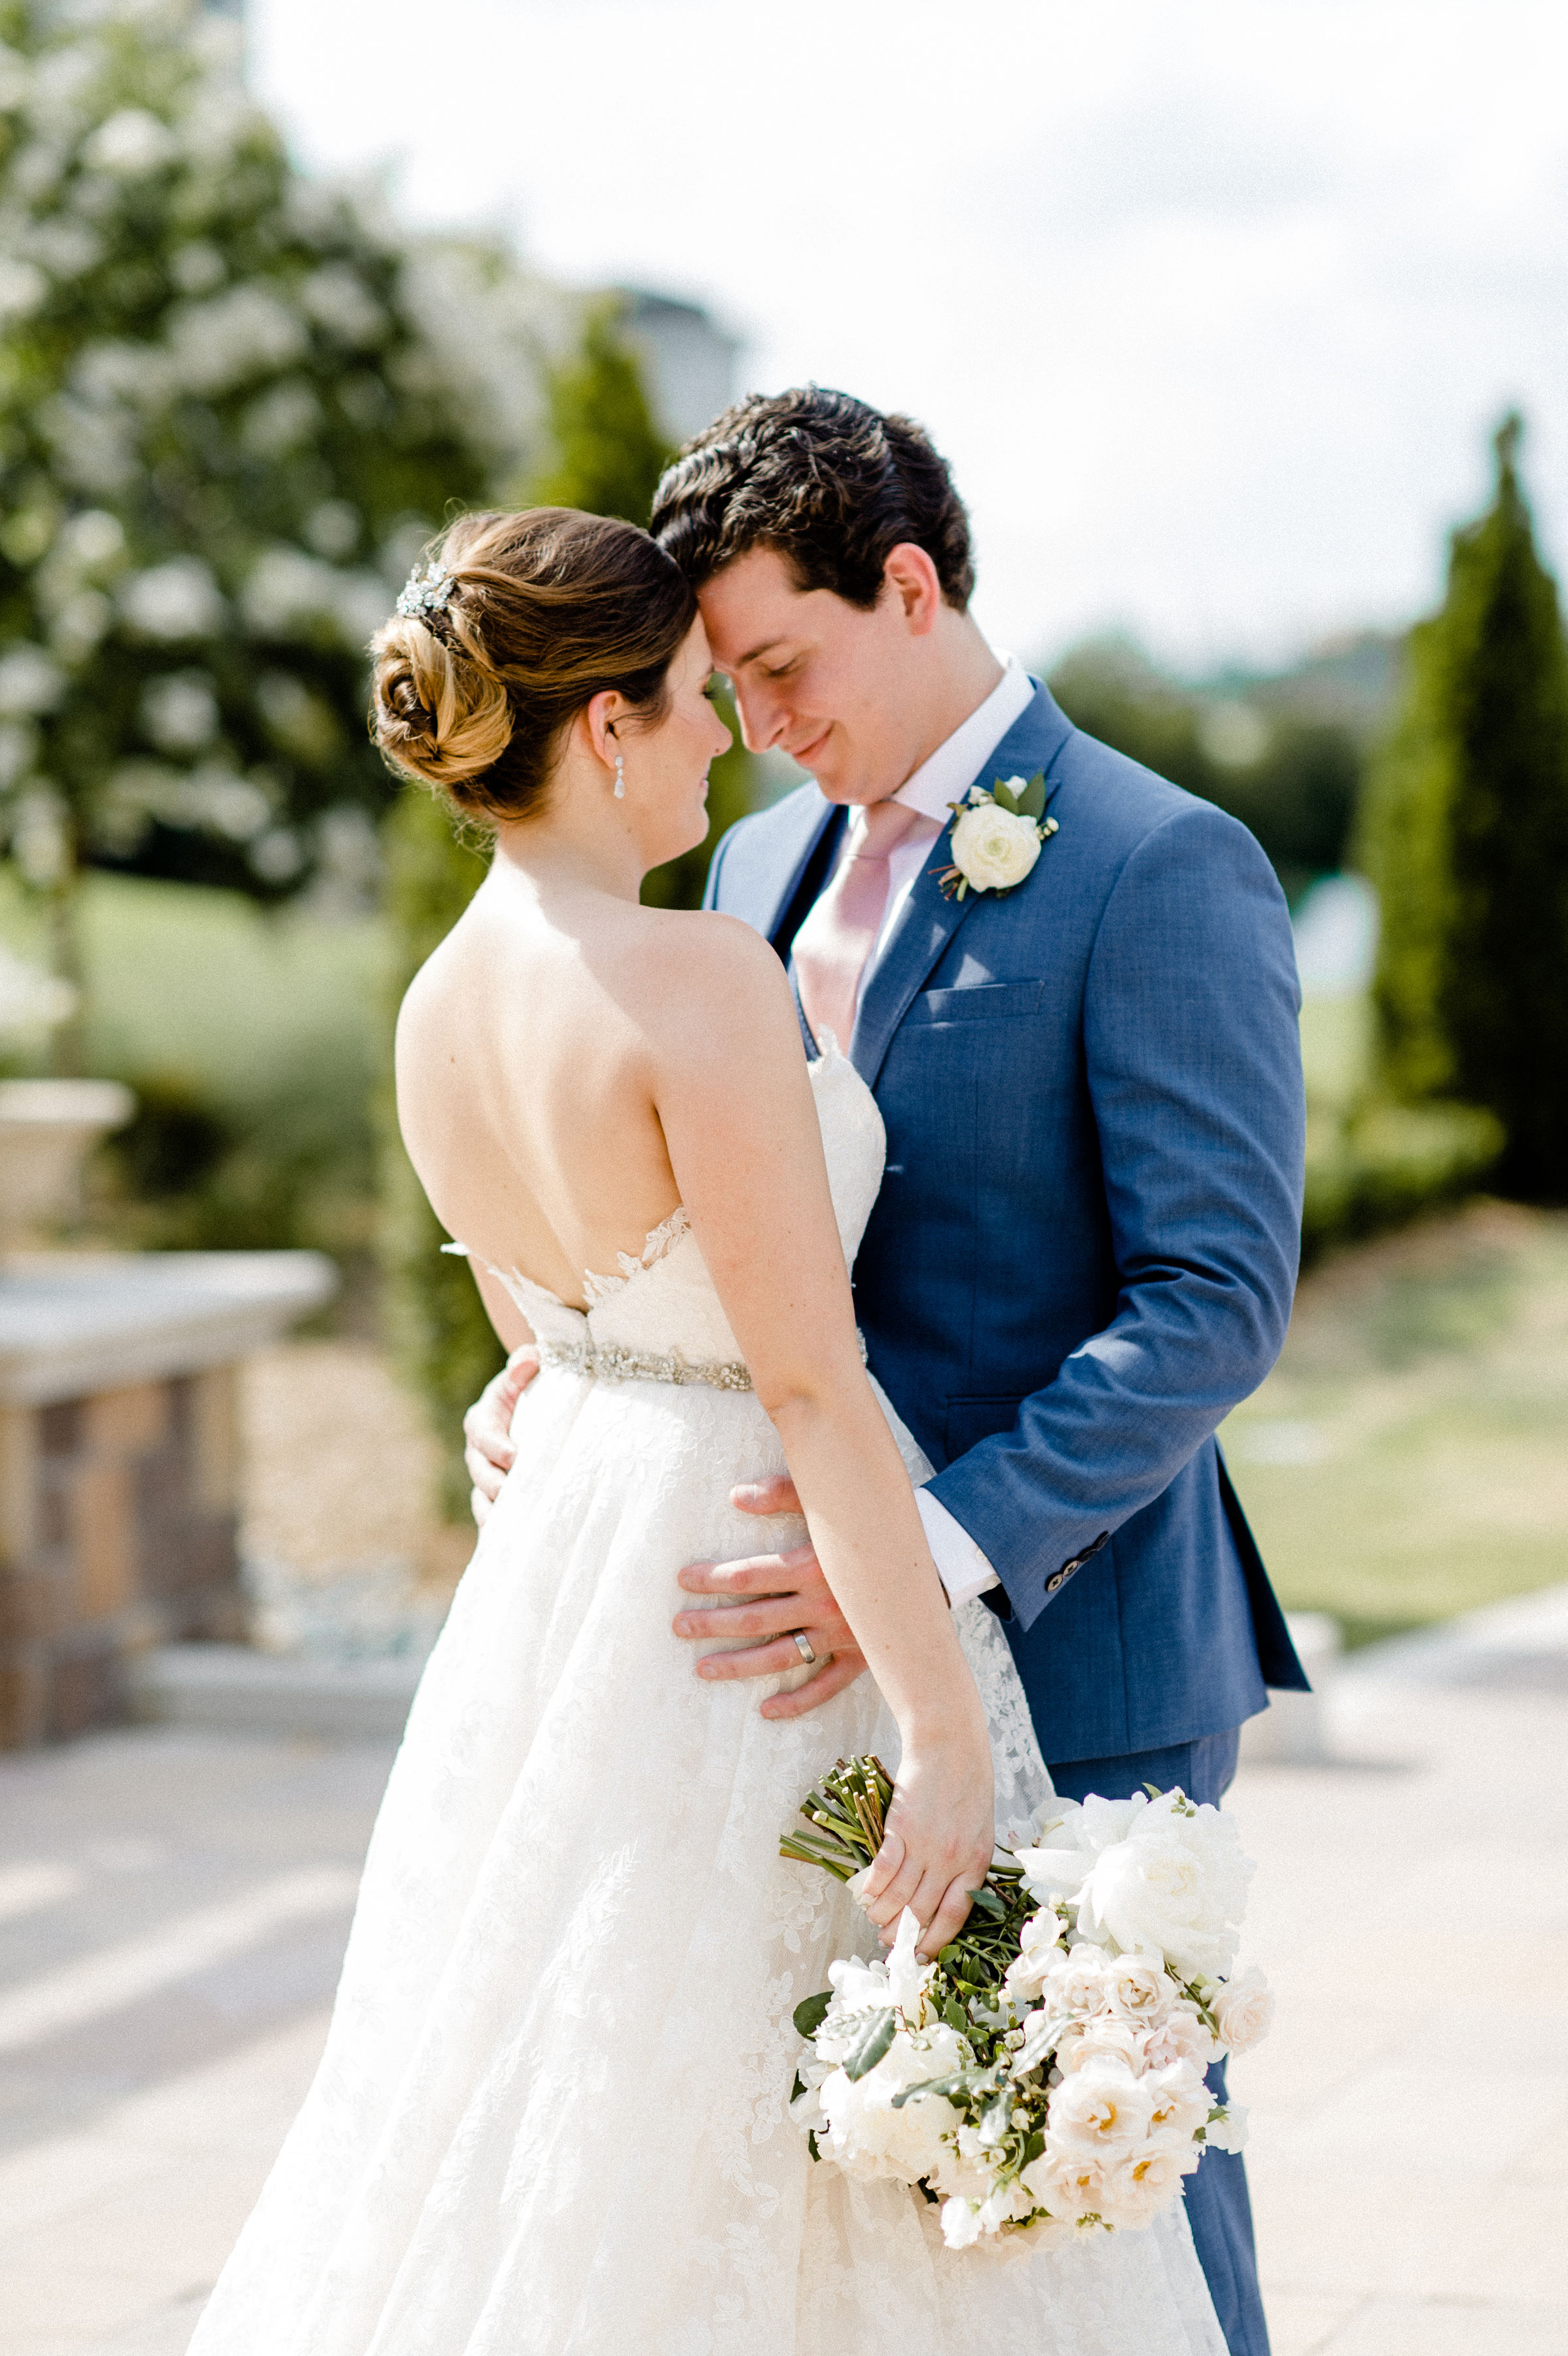 McElravey_Wedding_CarolineLimaPhotography_2018_199.jpg